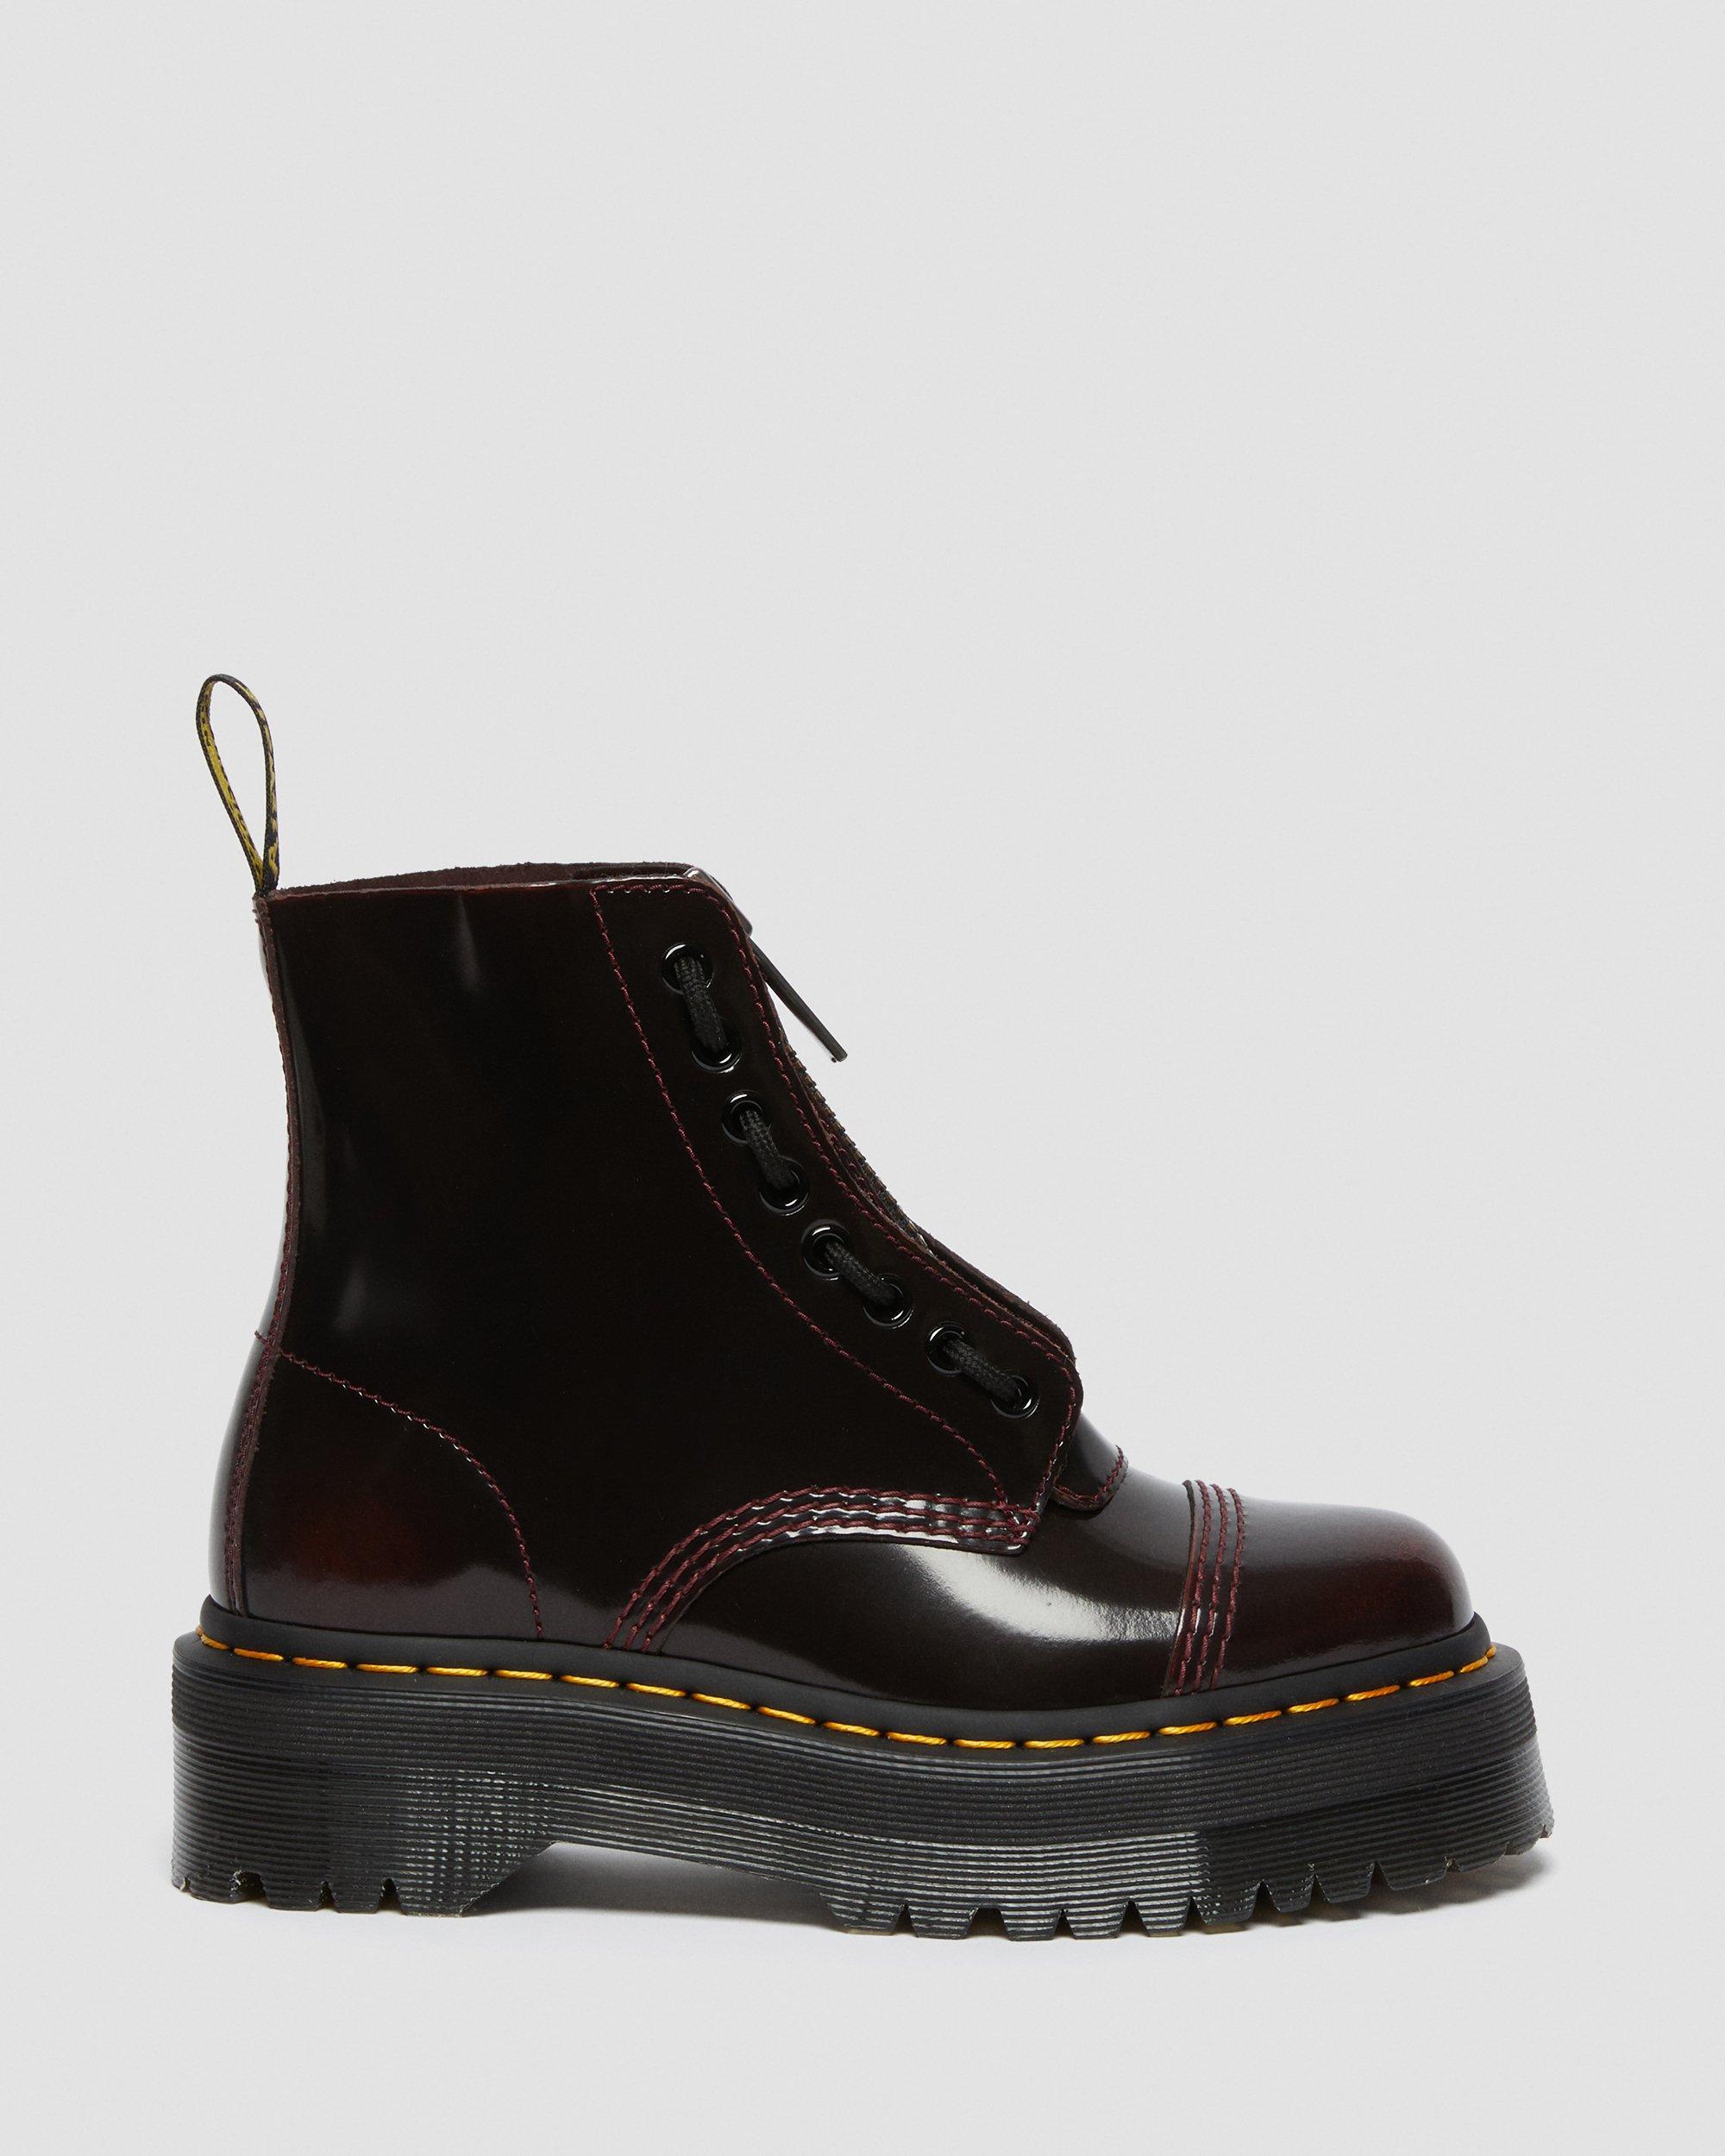 DR MARTENS Sinclair Arcadia Platform Boots